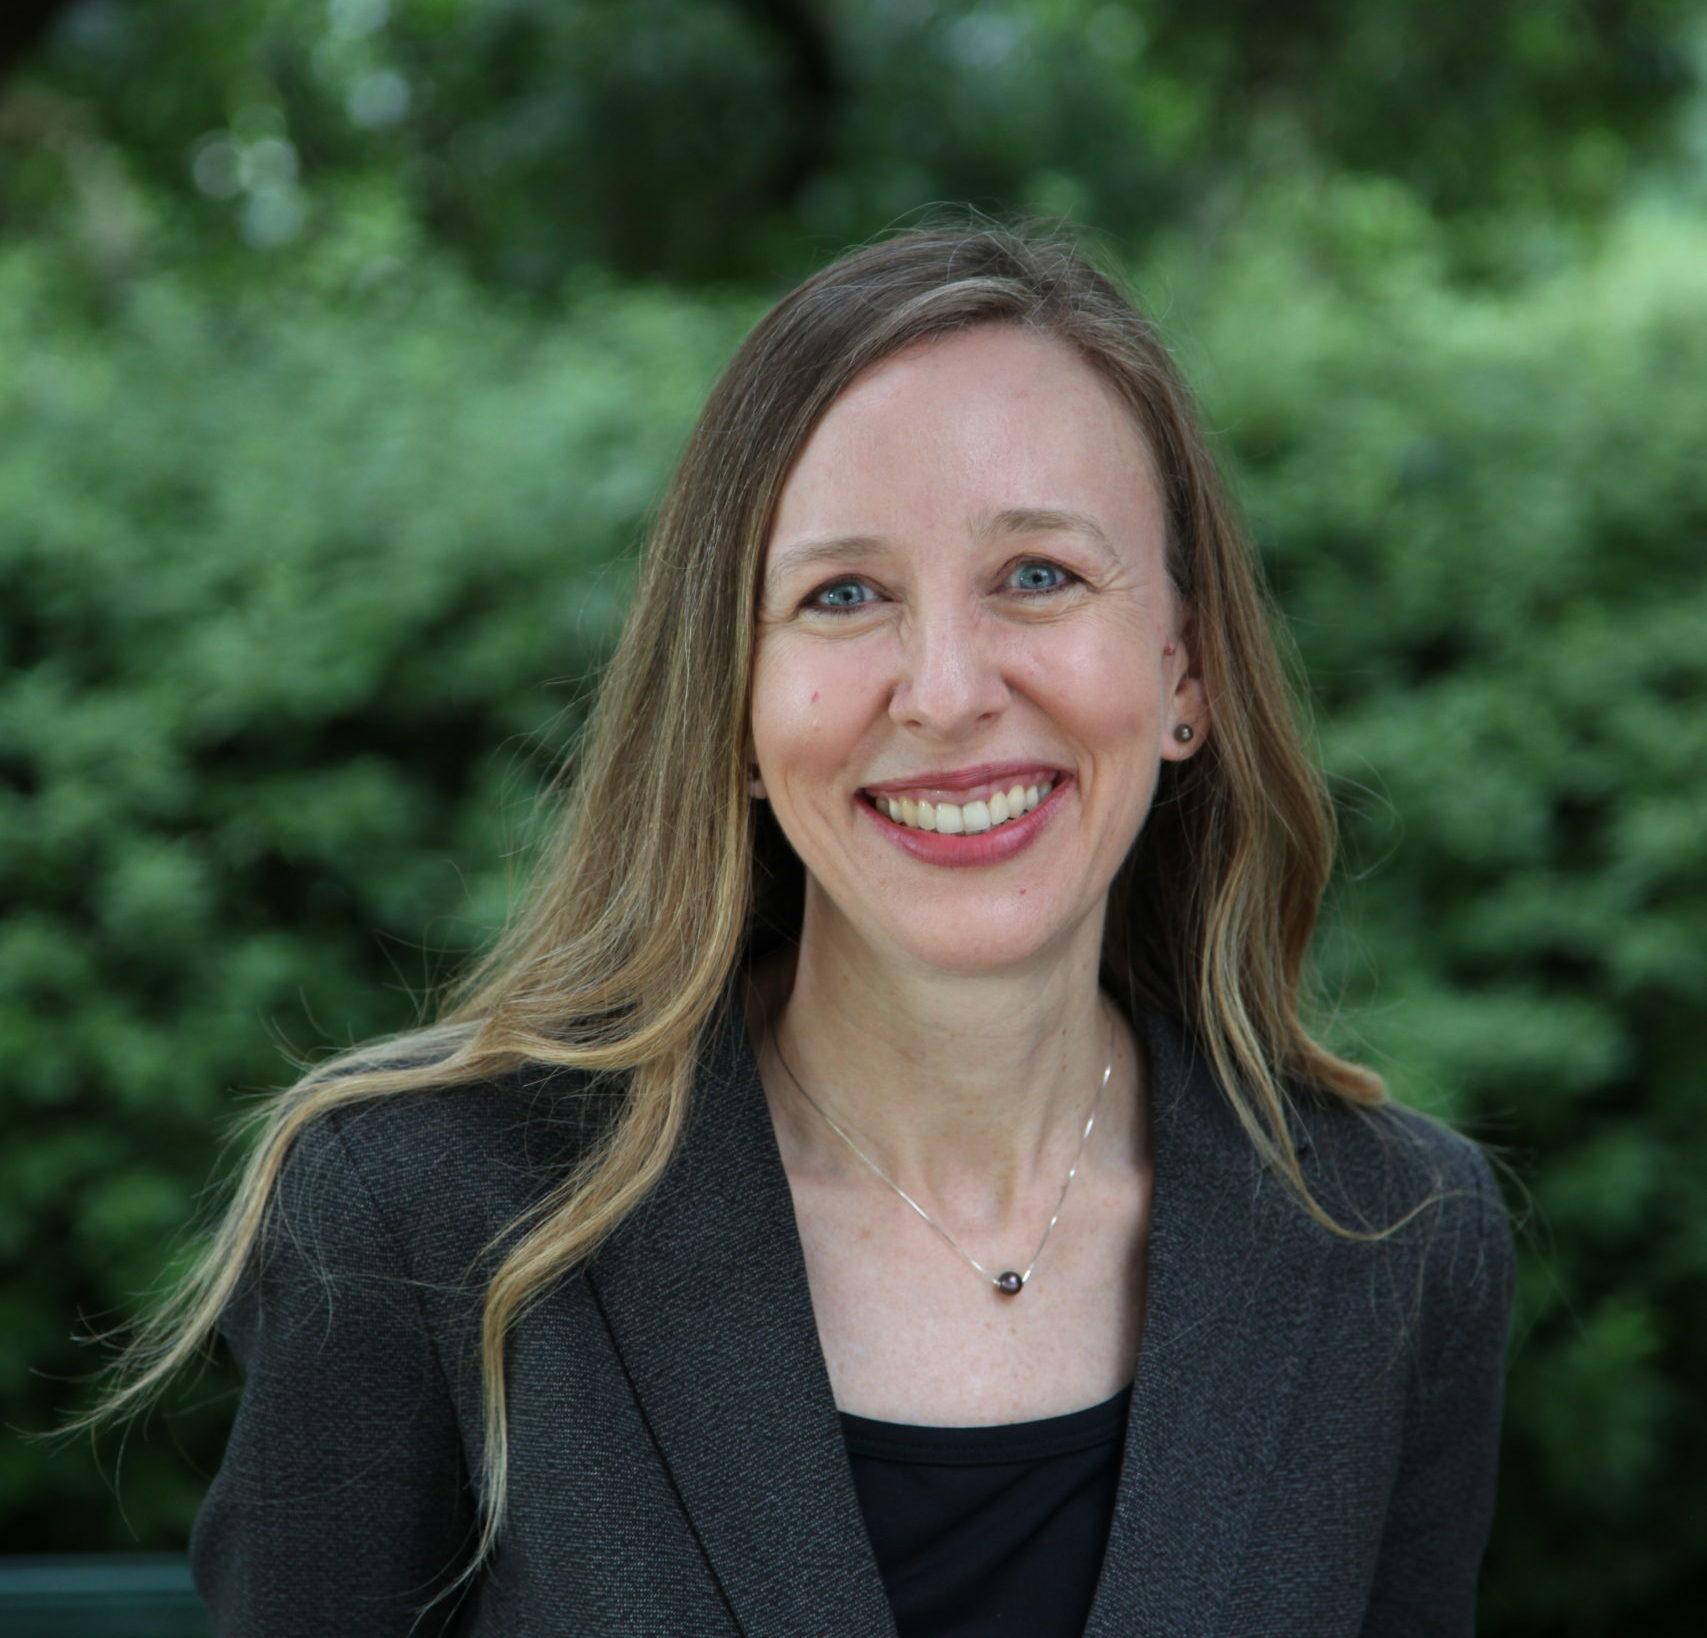 New Vice President of Enrollment Beth Clarke Discusses Enrollment Plans for the Fall Semester